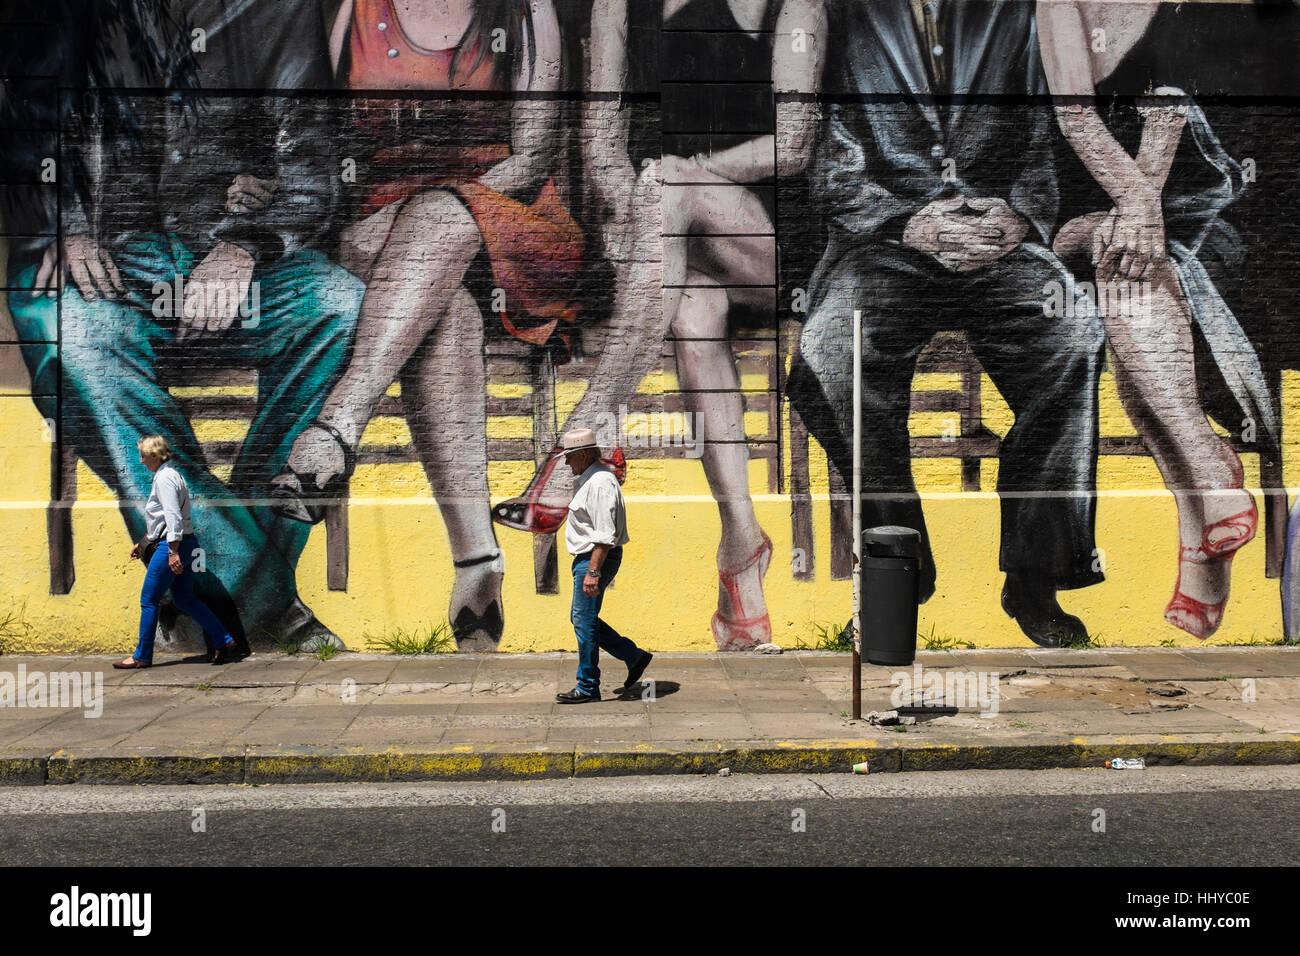 Oltrepassando una città murale raffigurante seduta coppie, Buenos Aires Immagini Stock